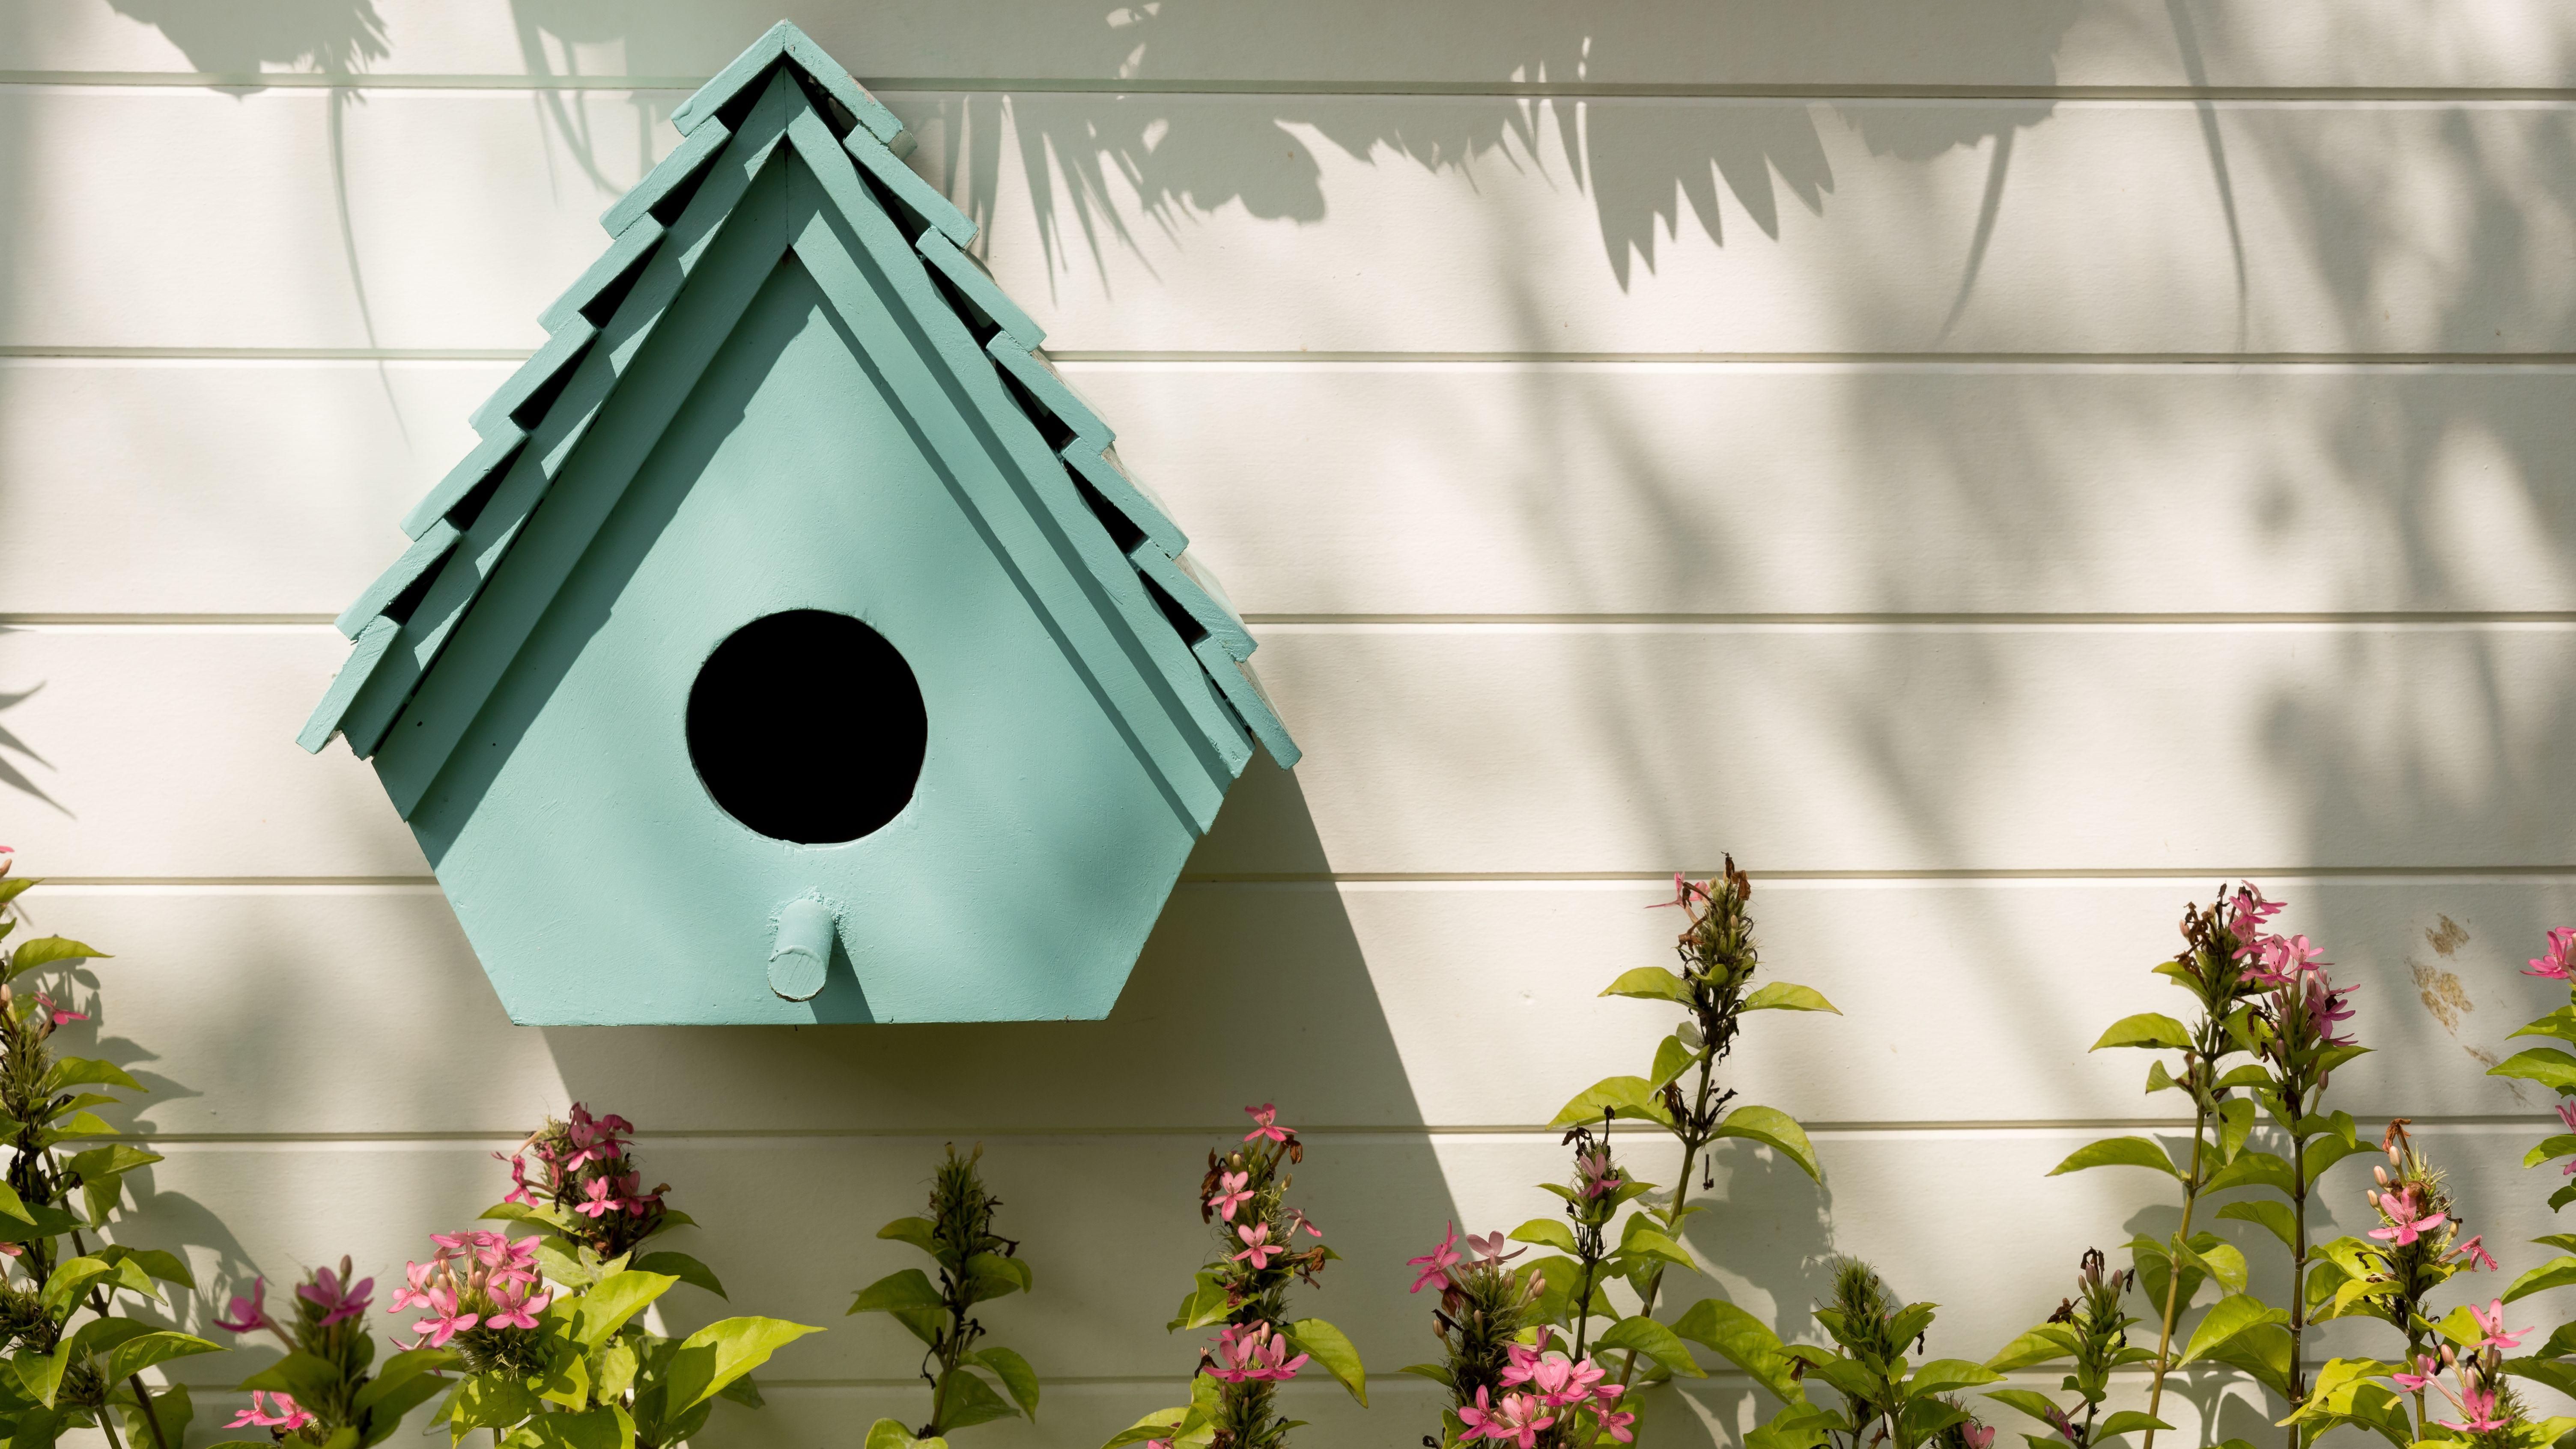 Large Victorian Birdhouse Handcrafted wooden birdhouse Rustic garden decor